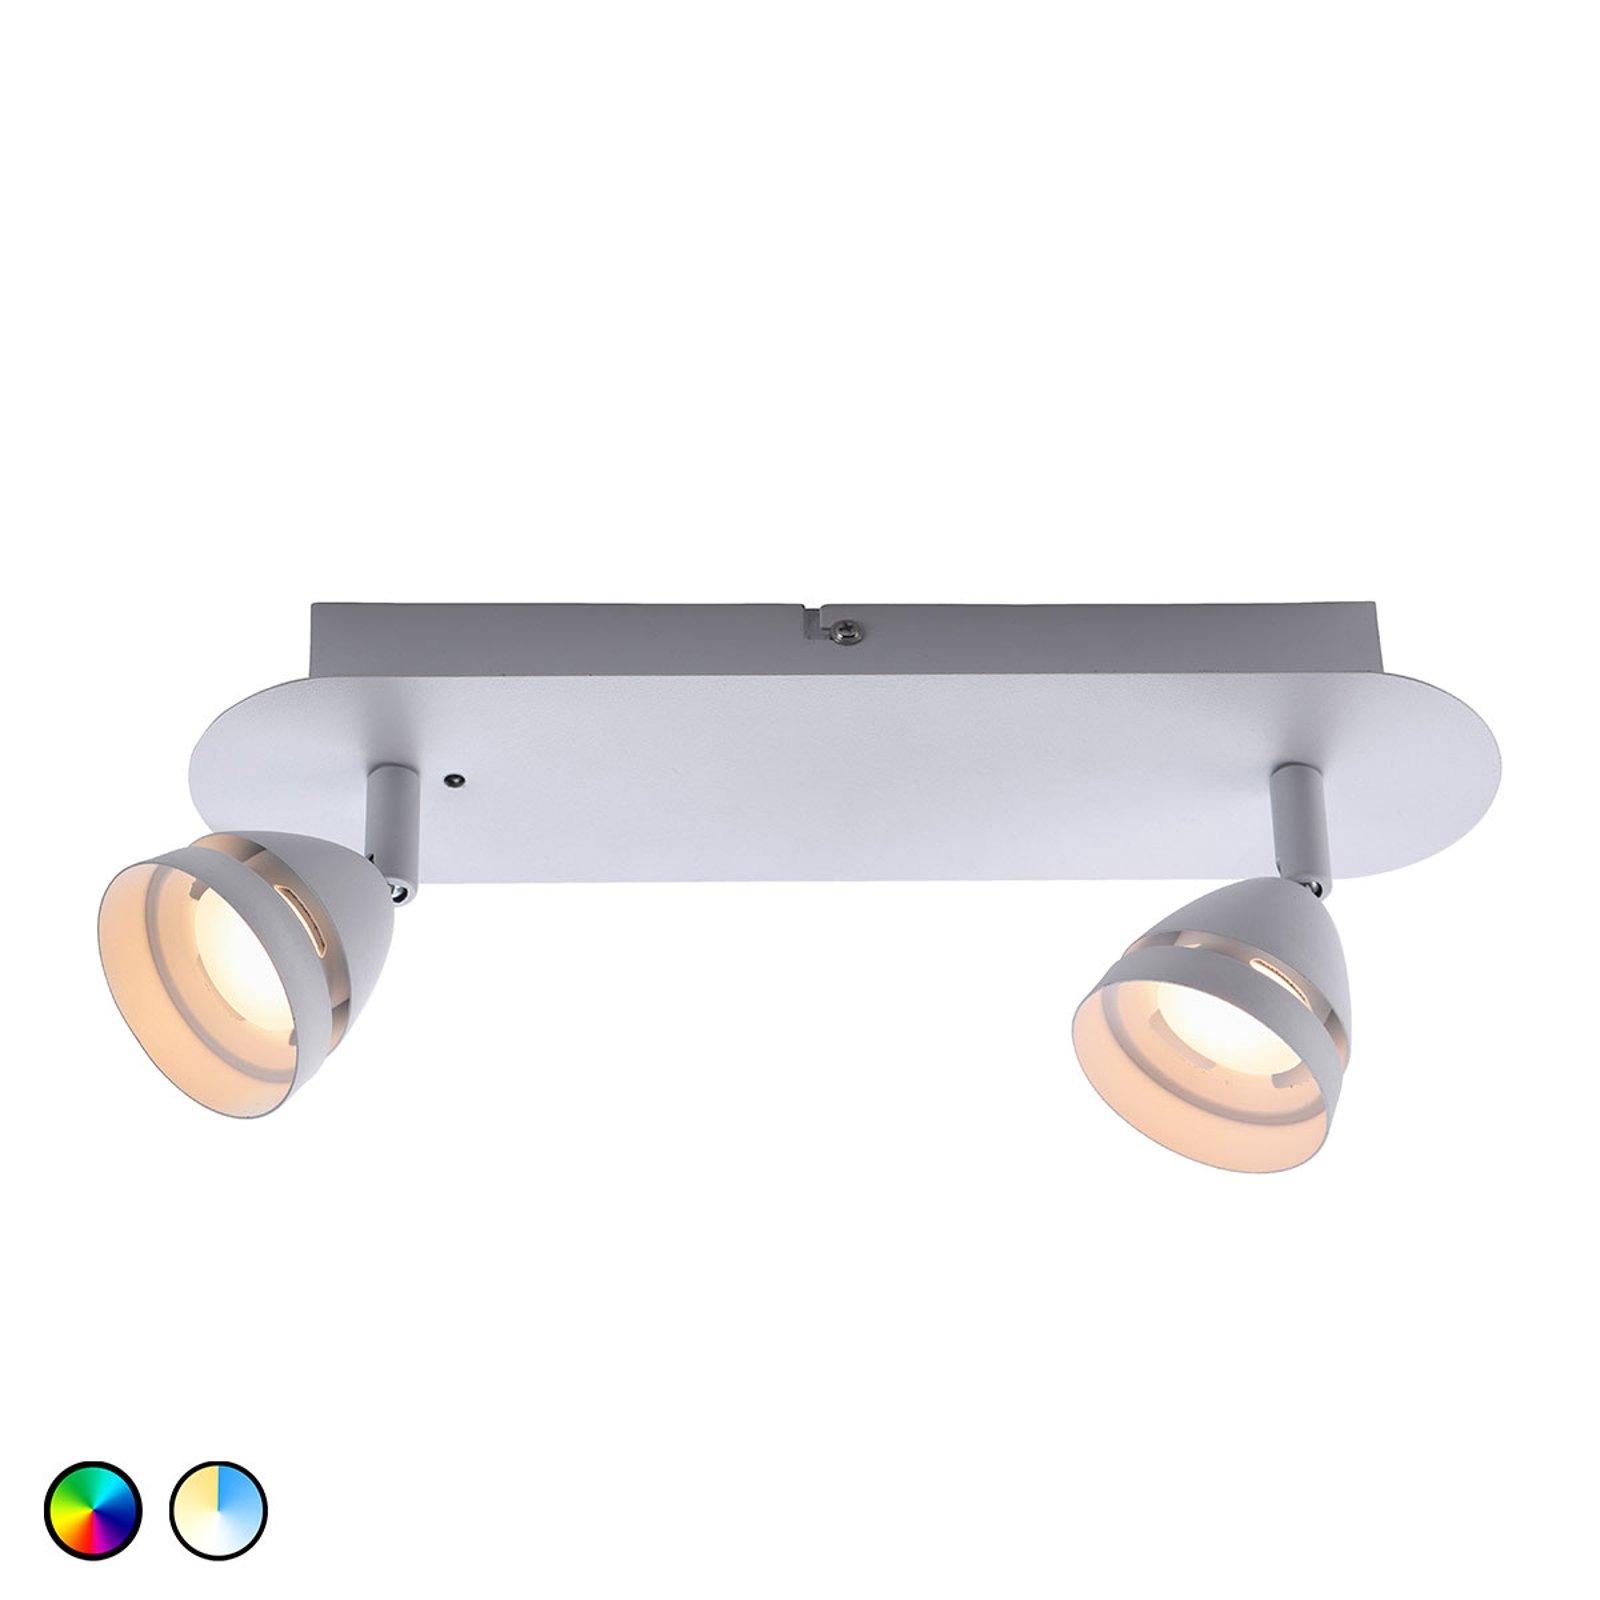 Trio WiZ Gemini LED-taklampe, 2 lys, hvit